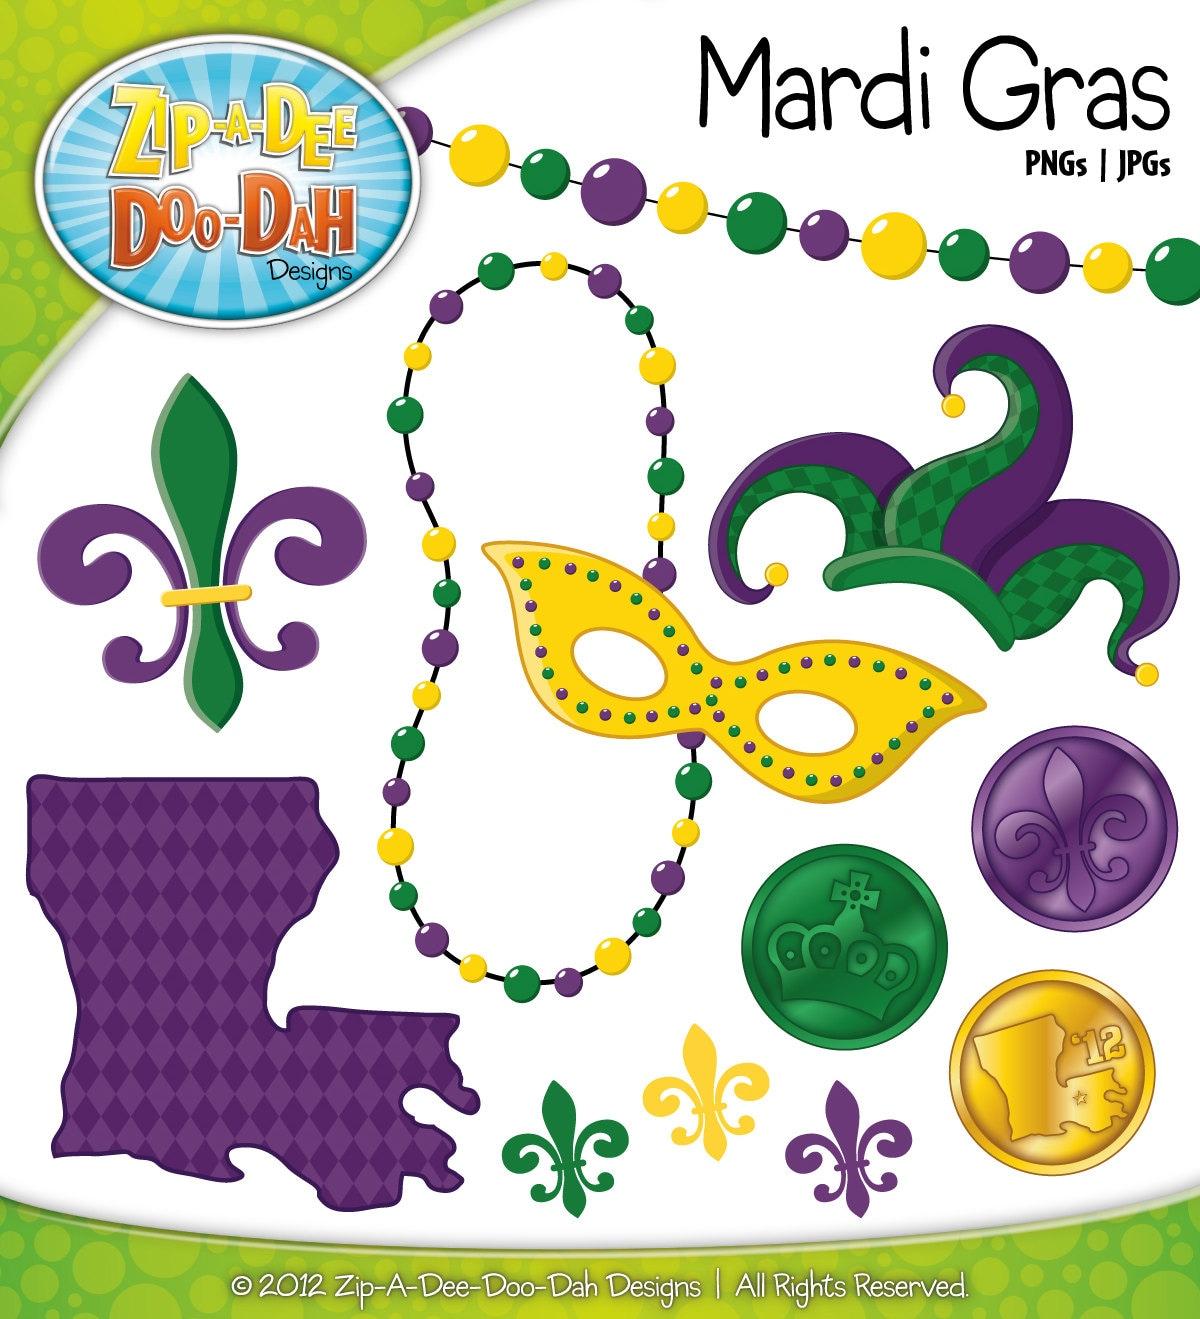 Mardi Gras Crown Clip Art Mardi gras clipart - includes